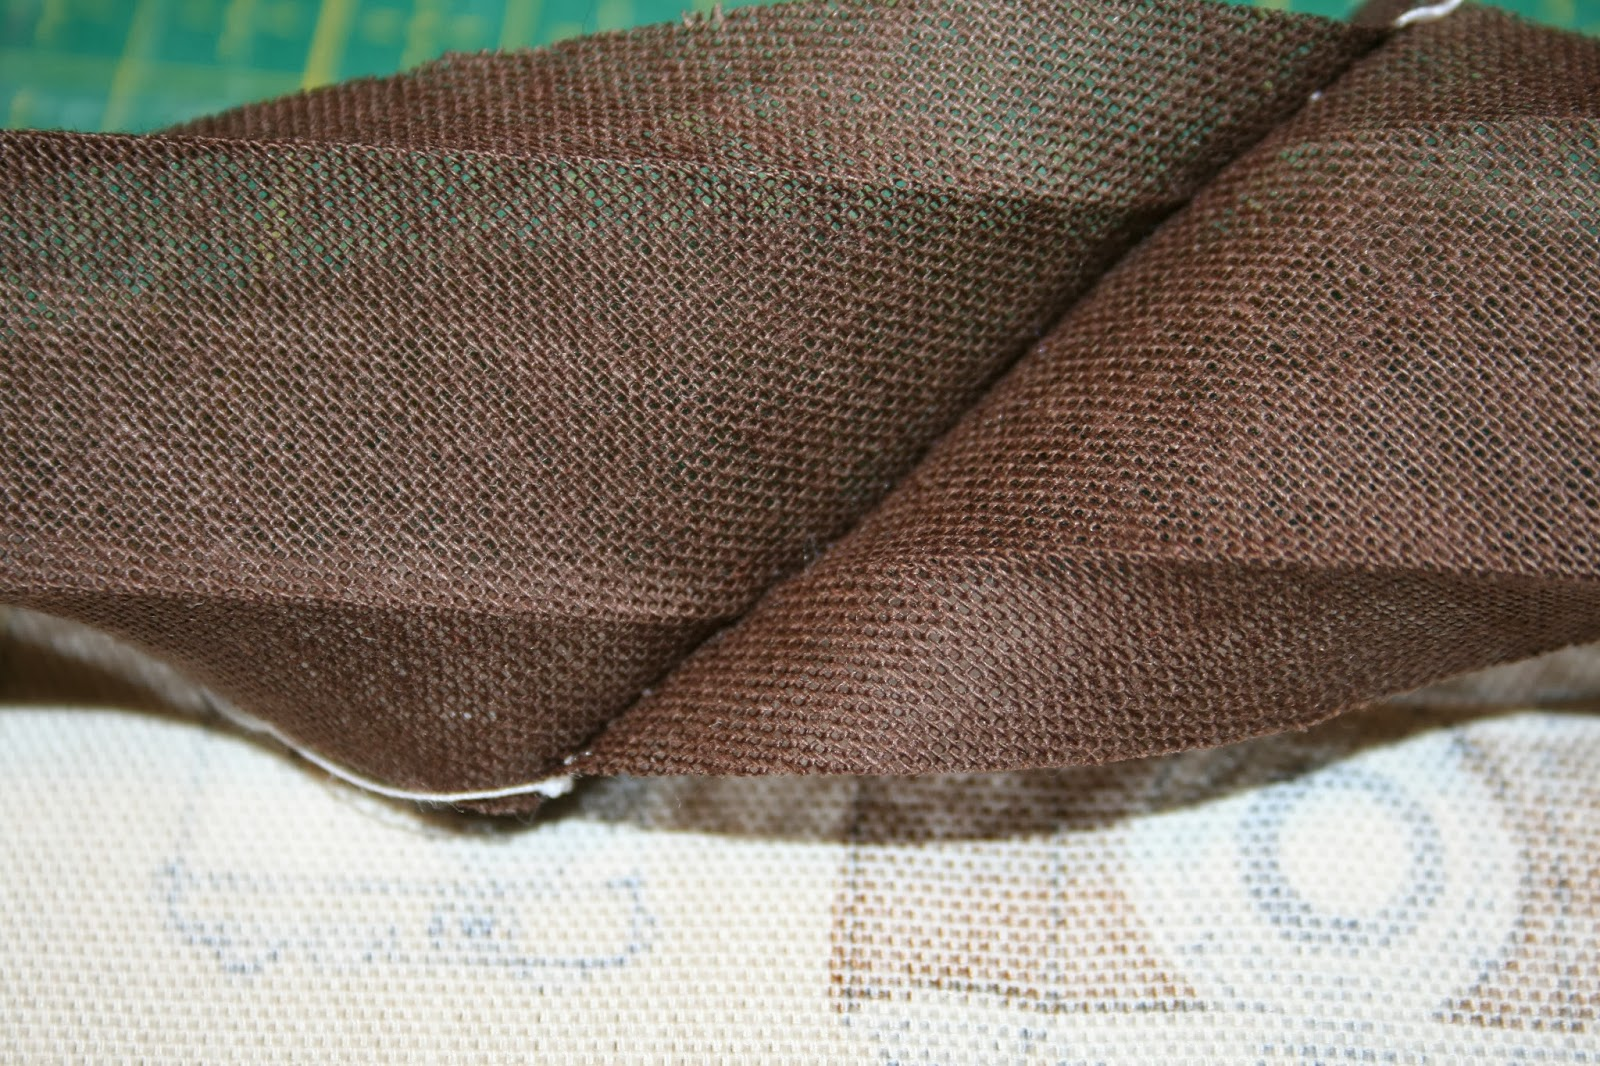 Stoffe Komplizen Anleitung Zum Schrägband Annähen